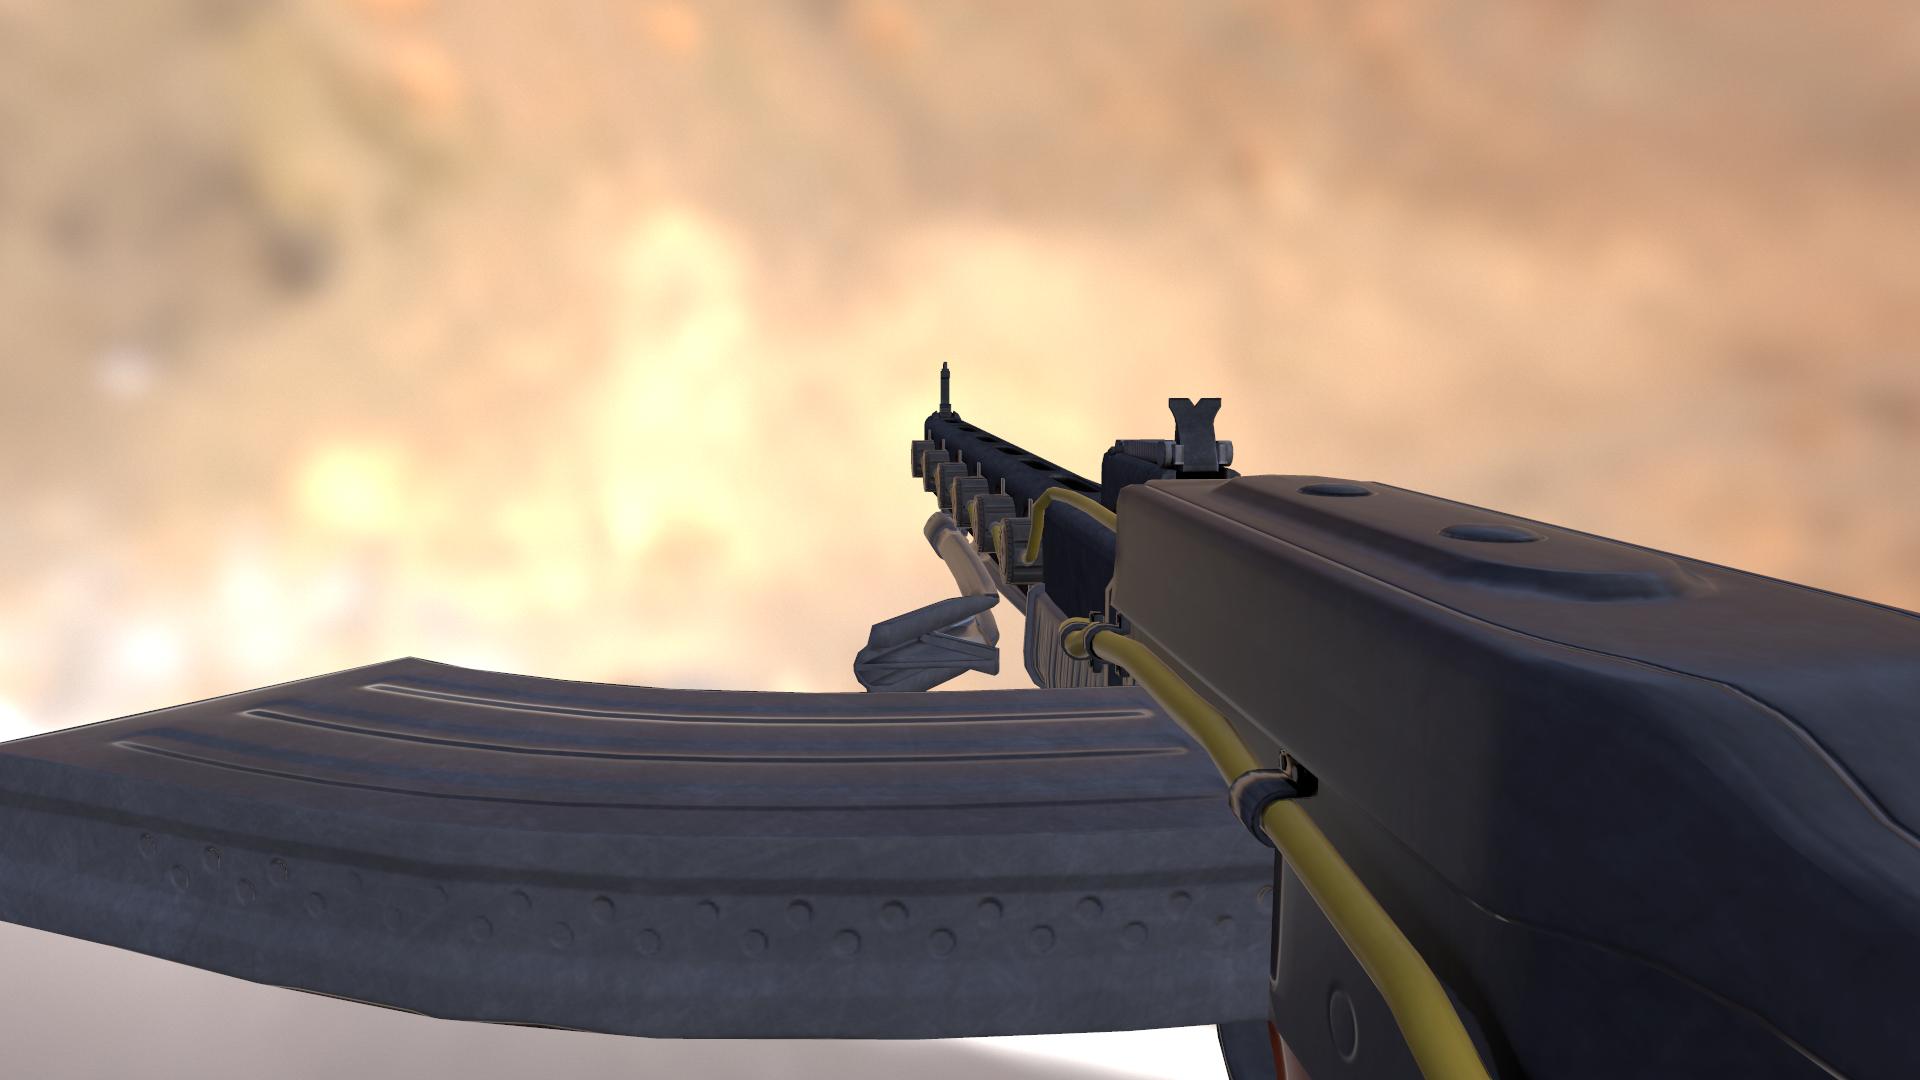 Fallout 4 Rail Rifle Mod Texturing-2 | Fallout 4 mods